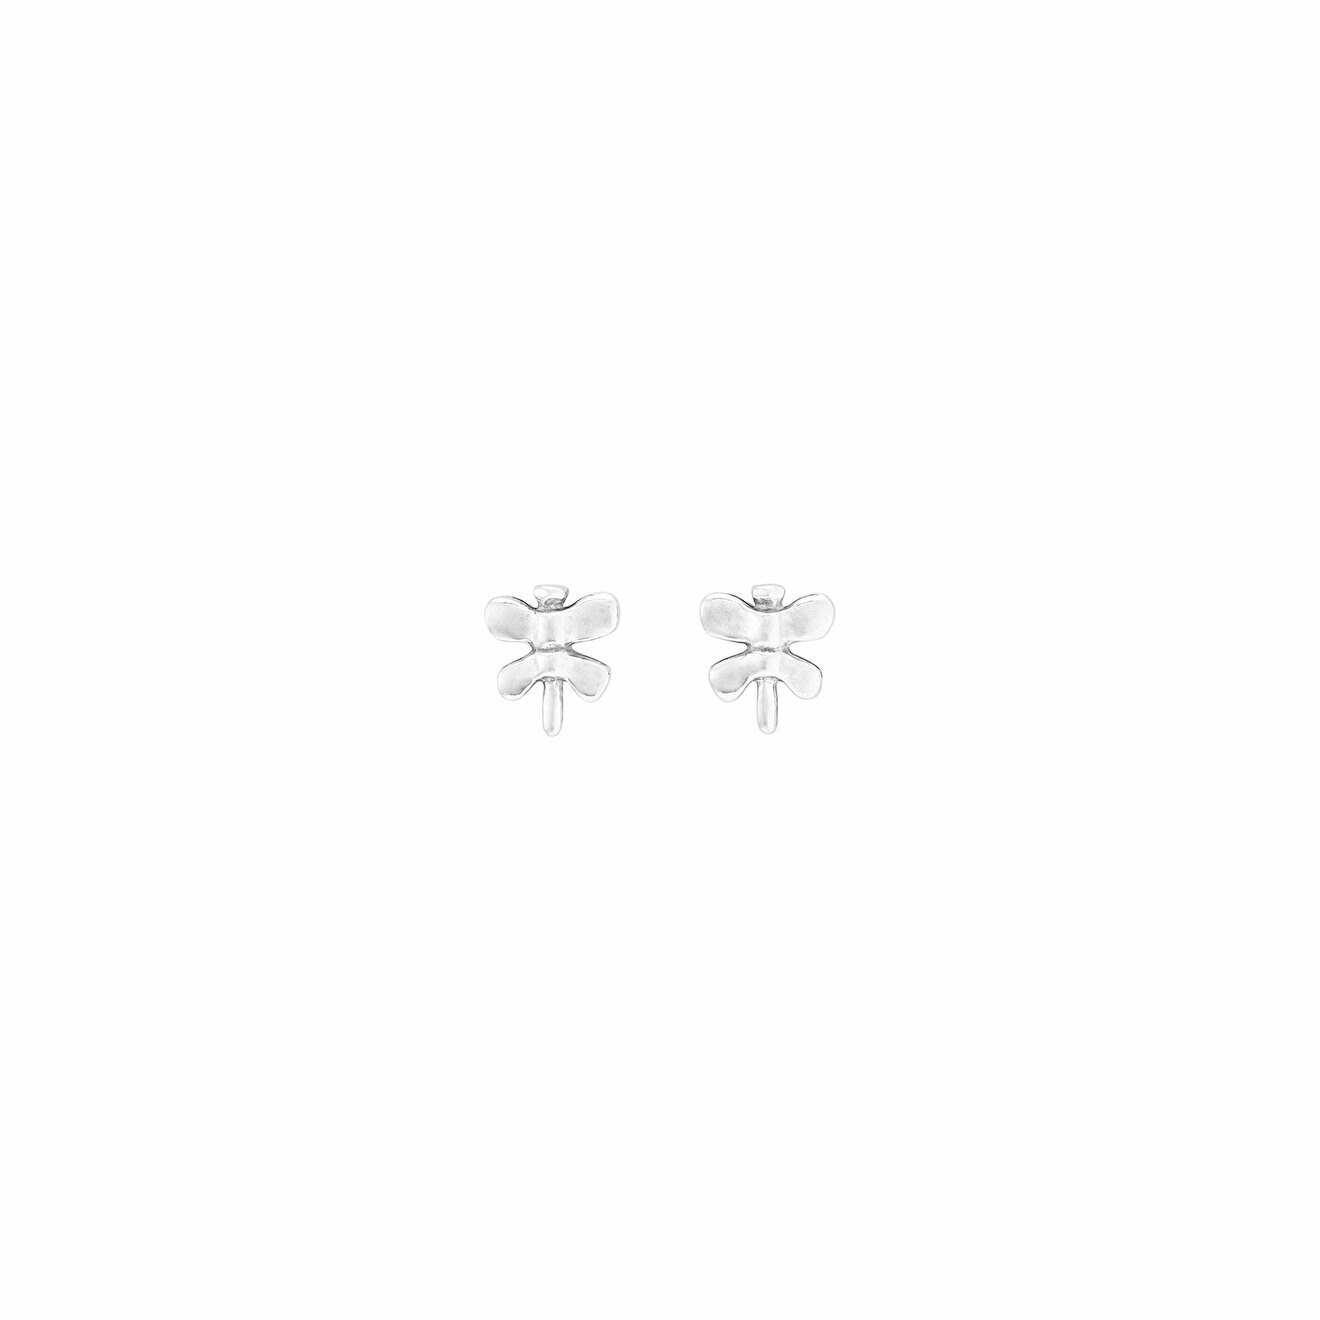 Unode50 Покрытые серебром пусеты-бабочки Just Be